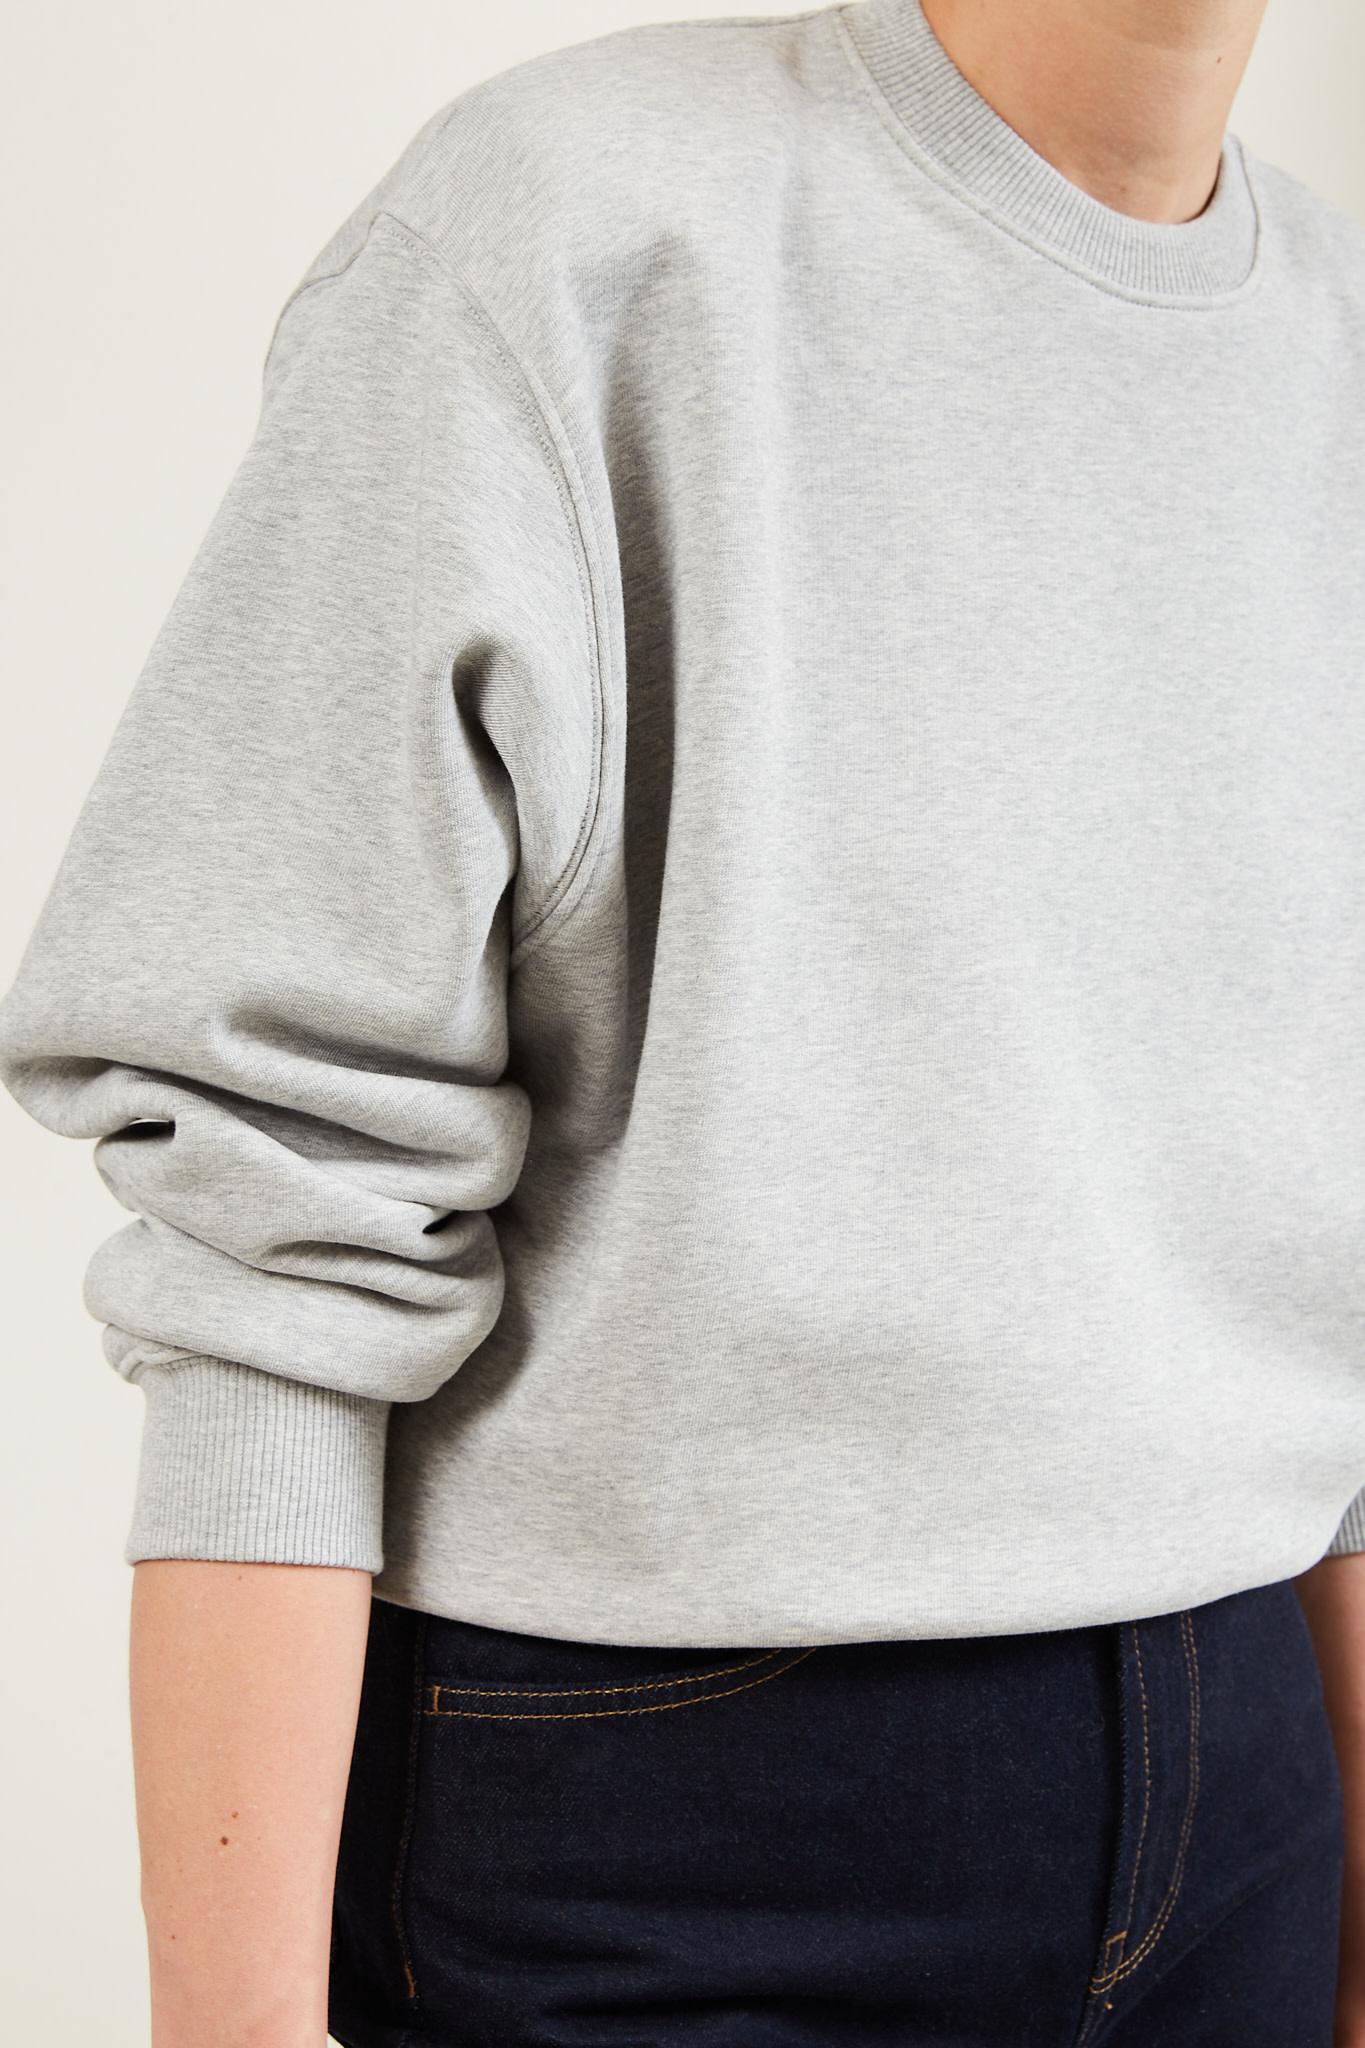 Róhe - Evin solid crew neck sweater